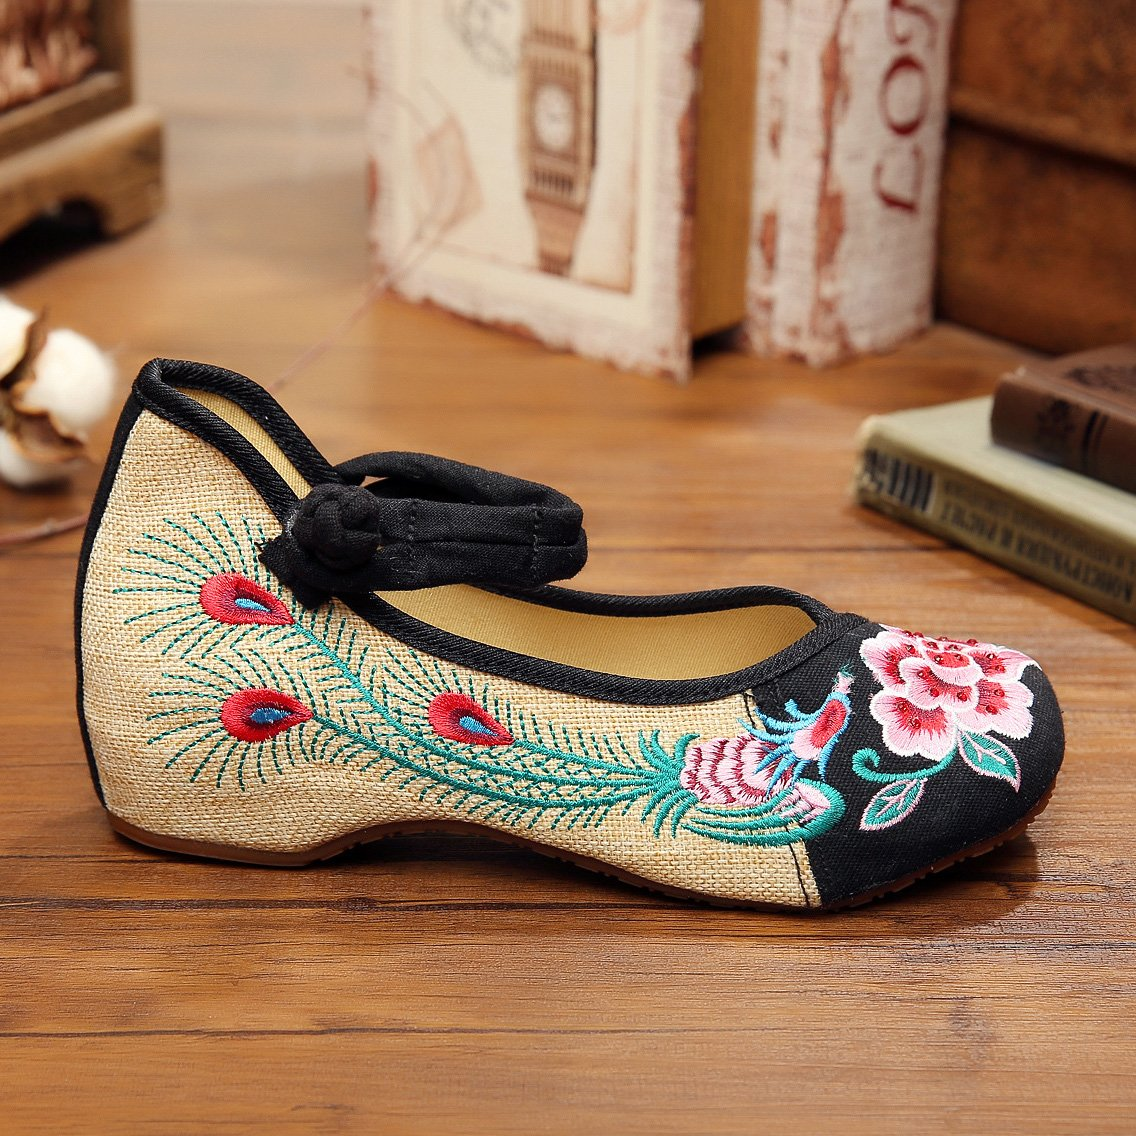 Veowalk Tiny Diamonds Embroidered Women Linen Shoes Ankle Buckle Retro Cotton Costume Dance Flat Ballets